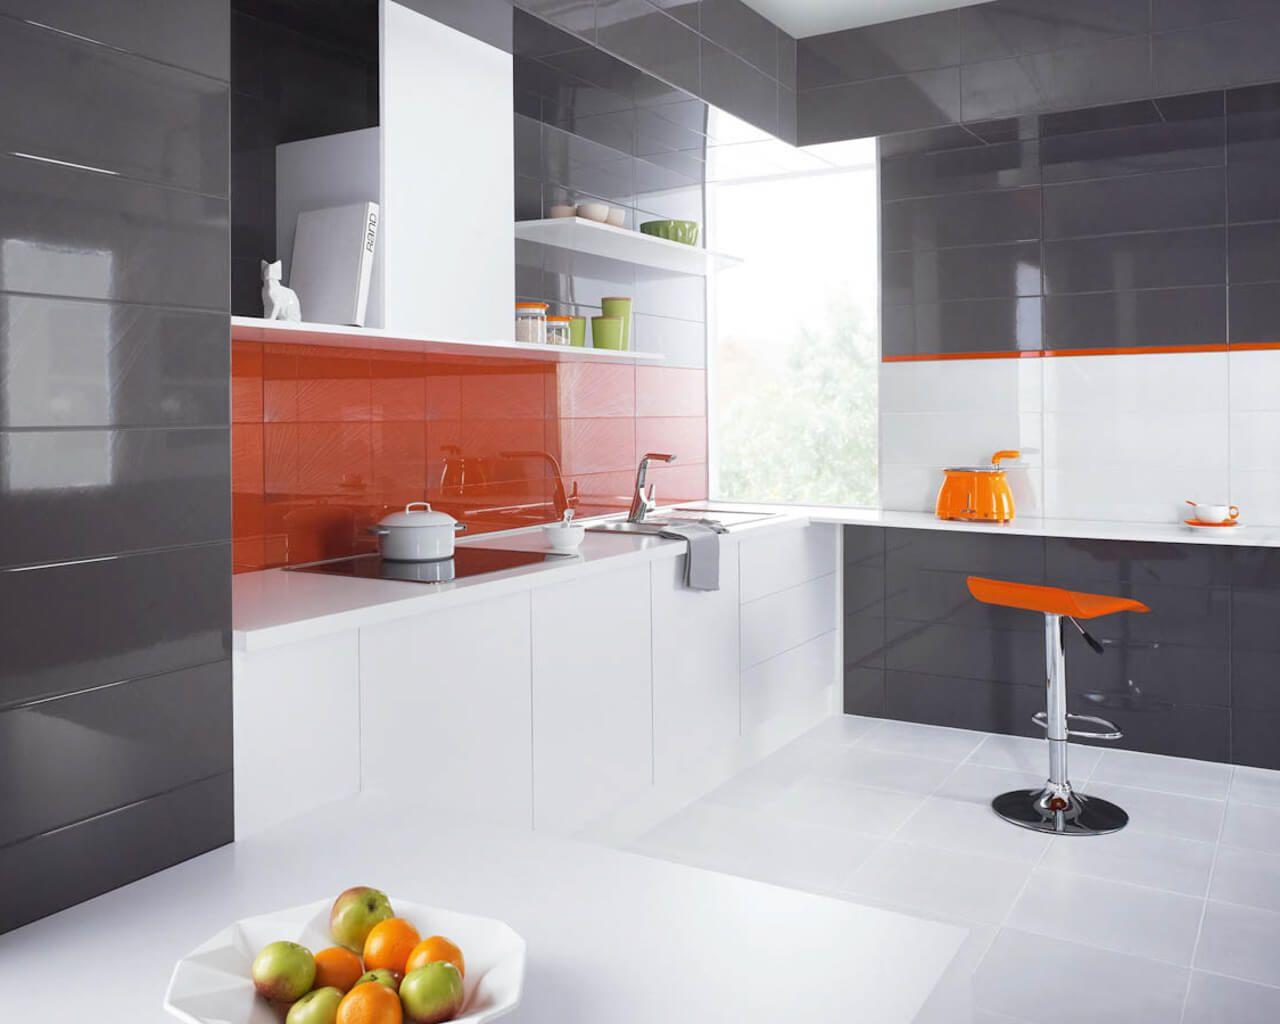 Yoshioka/Purio - glossy and elegant bathroom tiles | Ceramika Paradyz